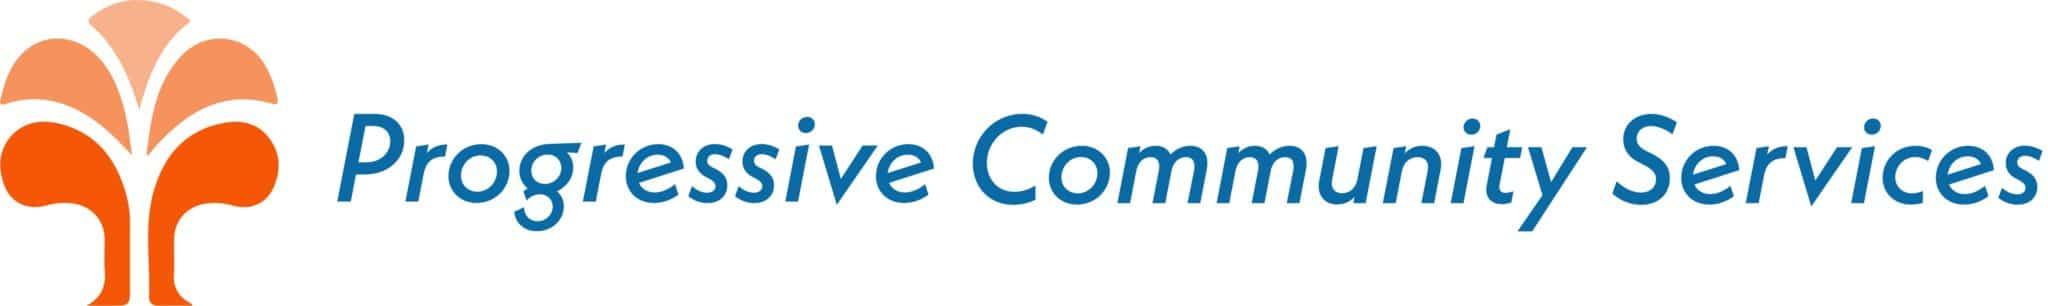 Progressive Community Services logo